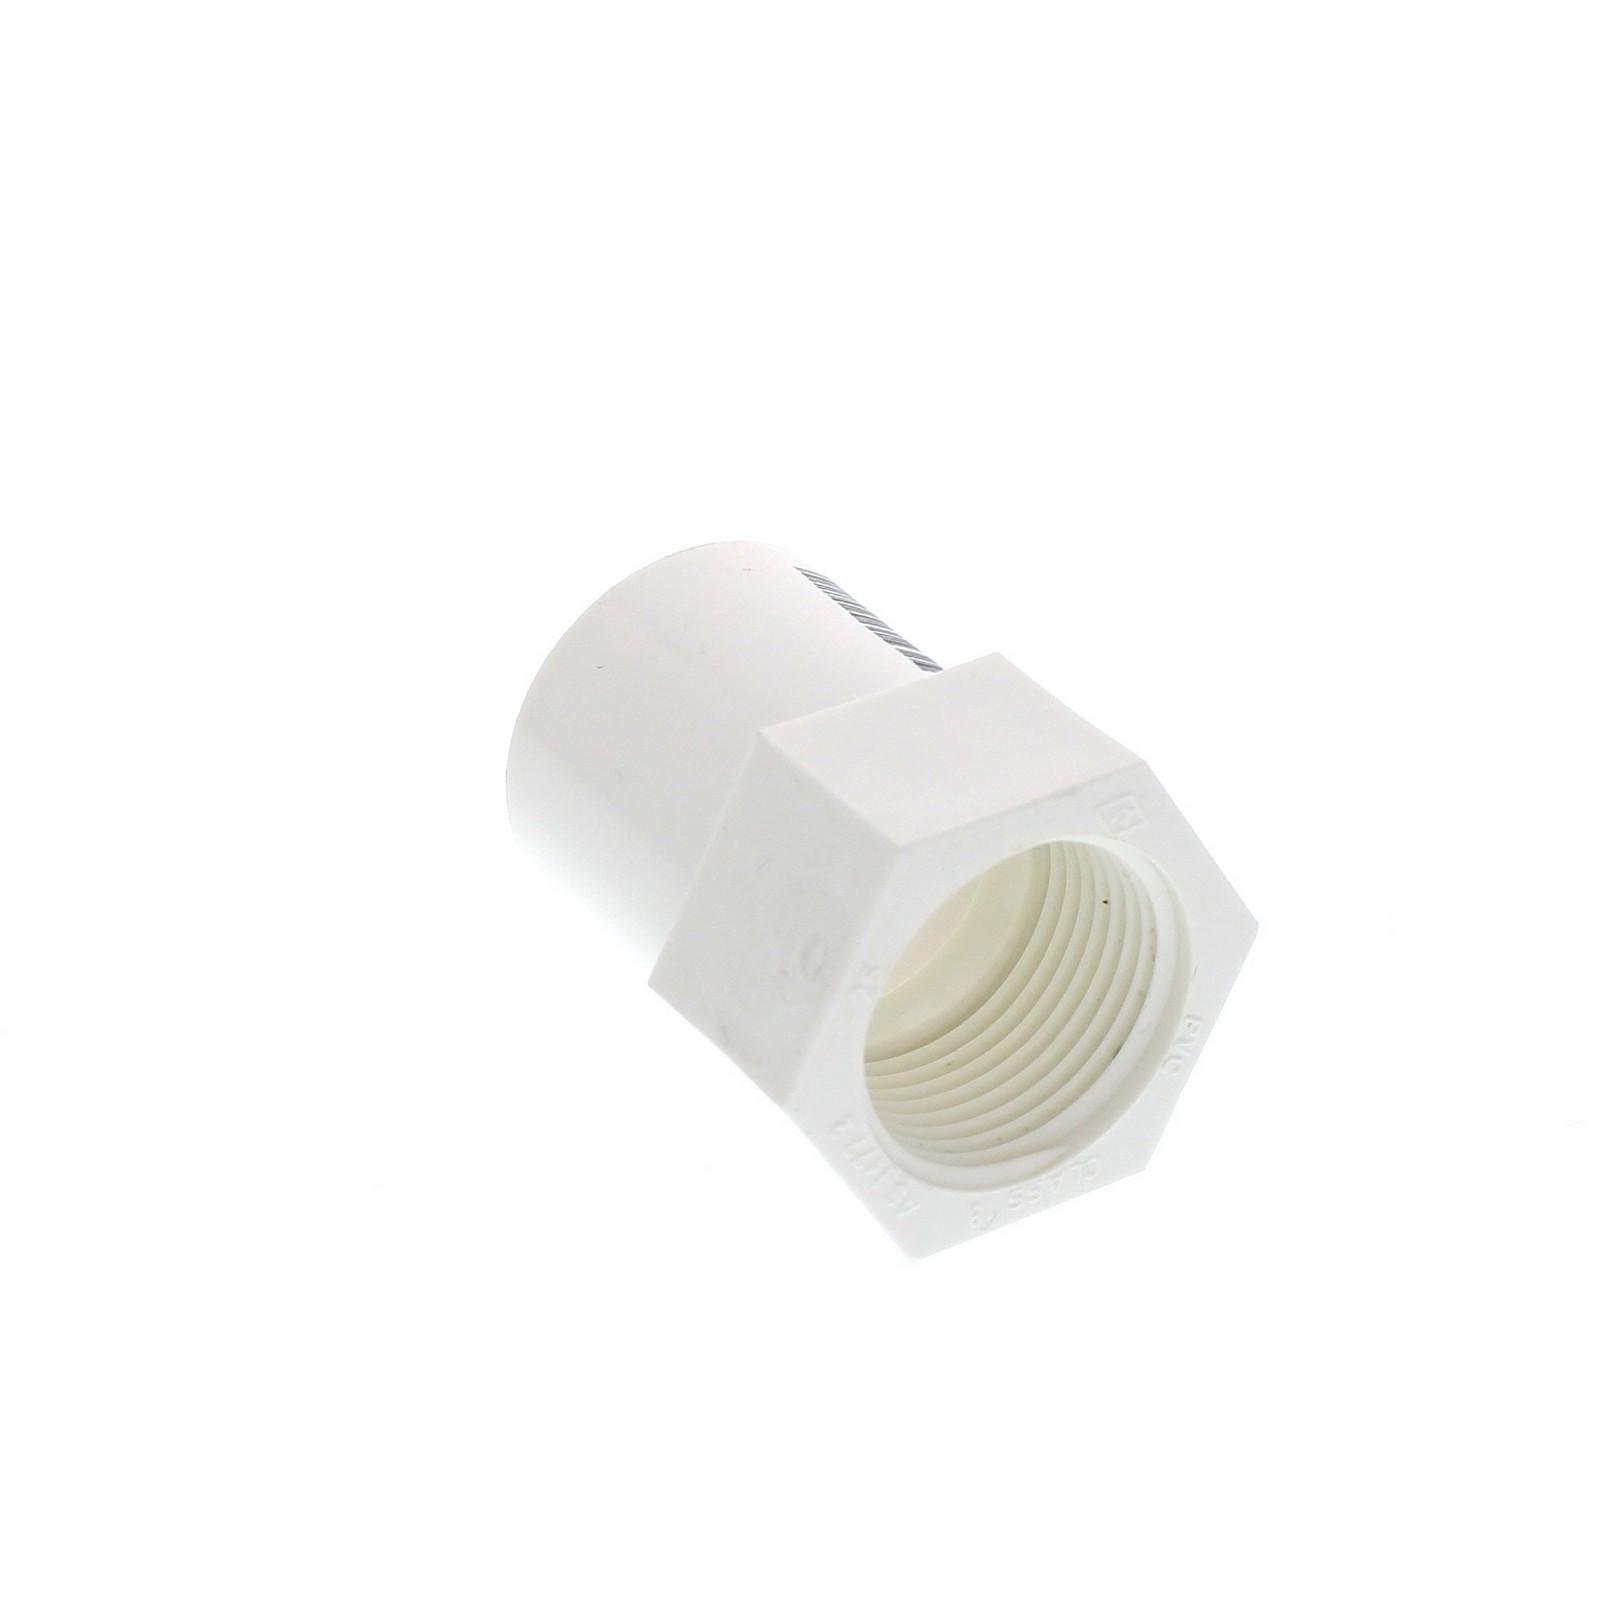 Vinidex faucet socket pvc mm pressure pipe fitting